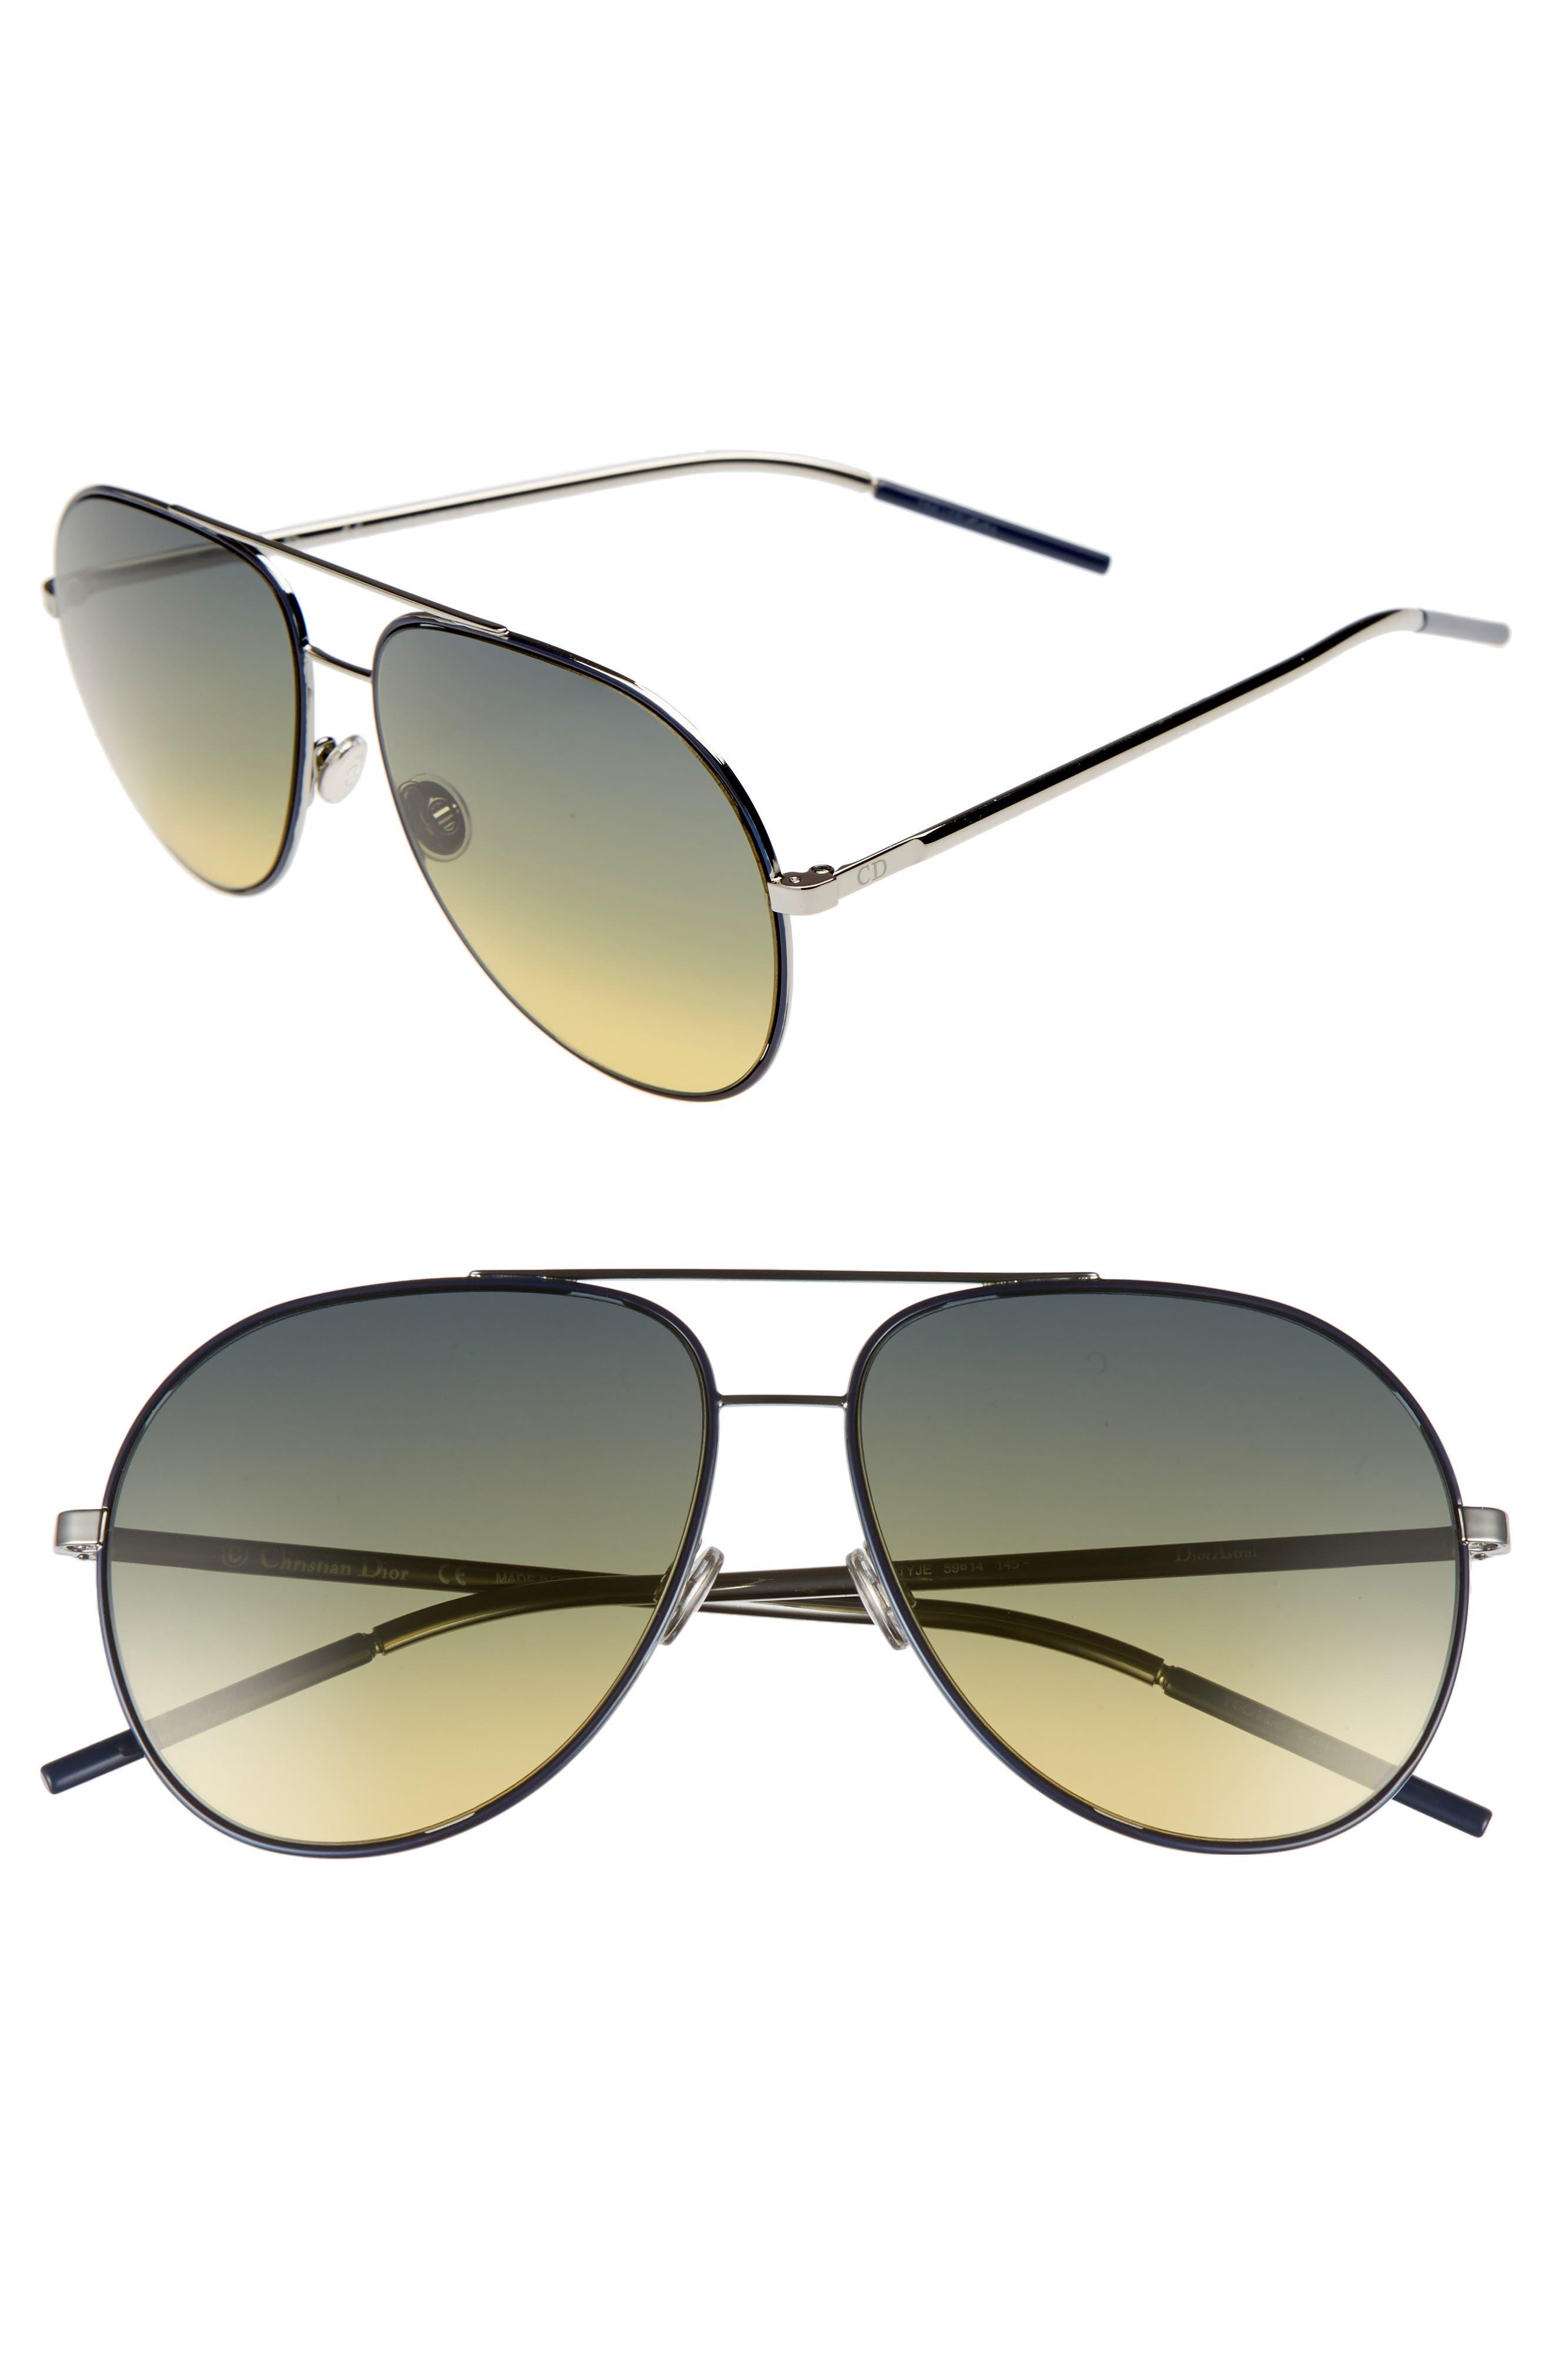 Astrals 59mm Aviator Sunglasses,                             Main thumbnail 1, color,                             Blue Ruthenium